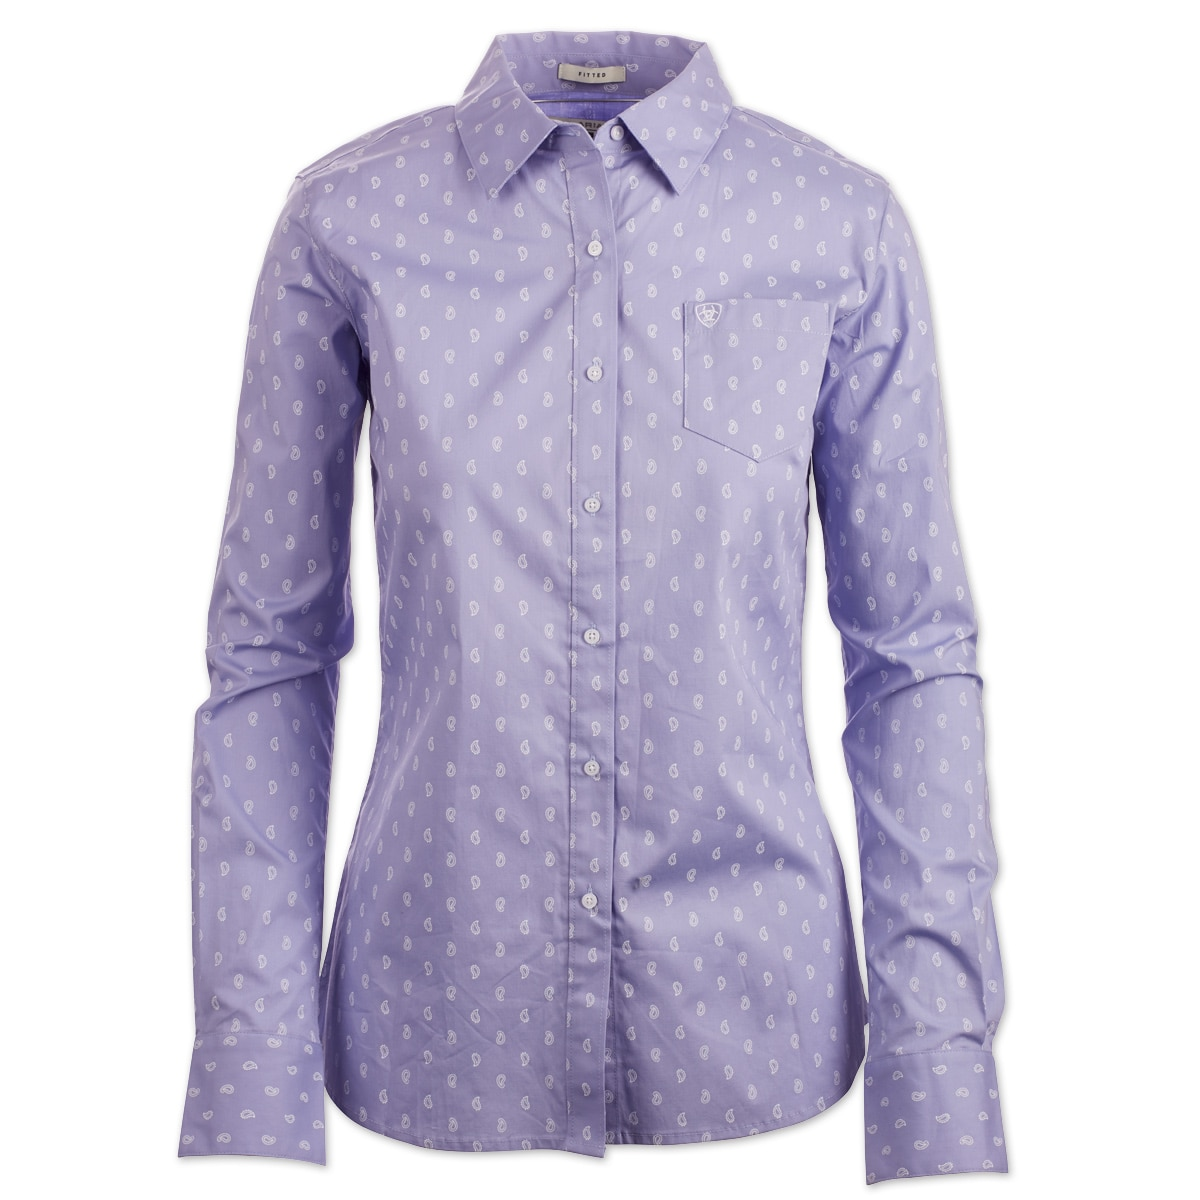 Ariat Kirby Stretch Azulene Paisley Shirt